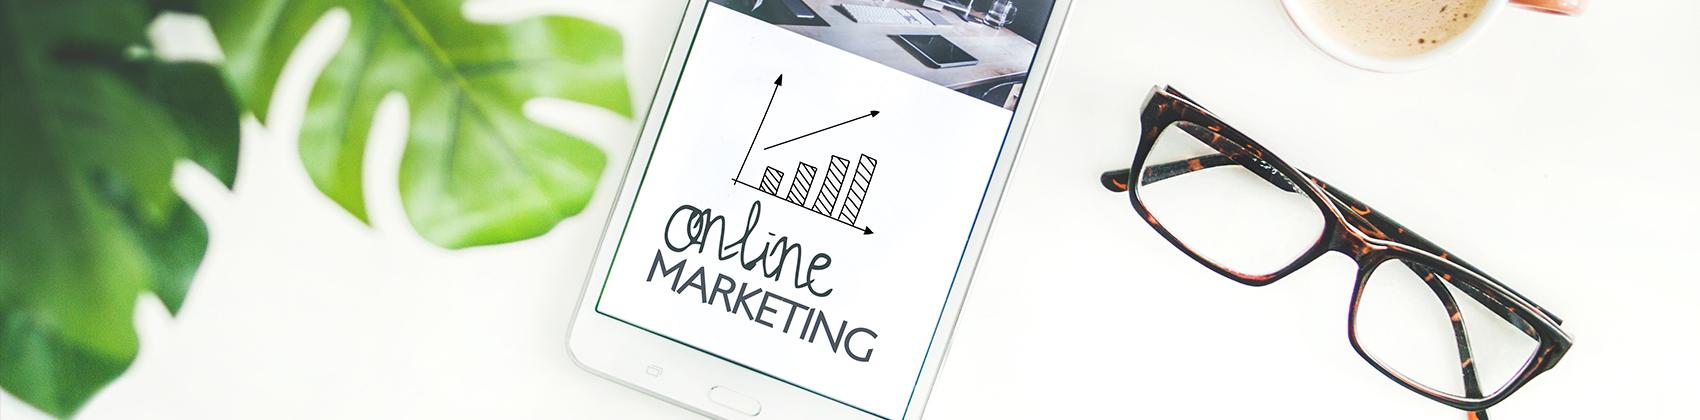 Tablet online marketing